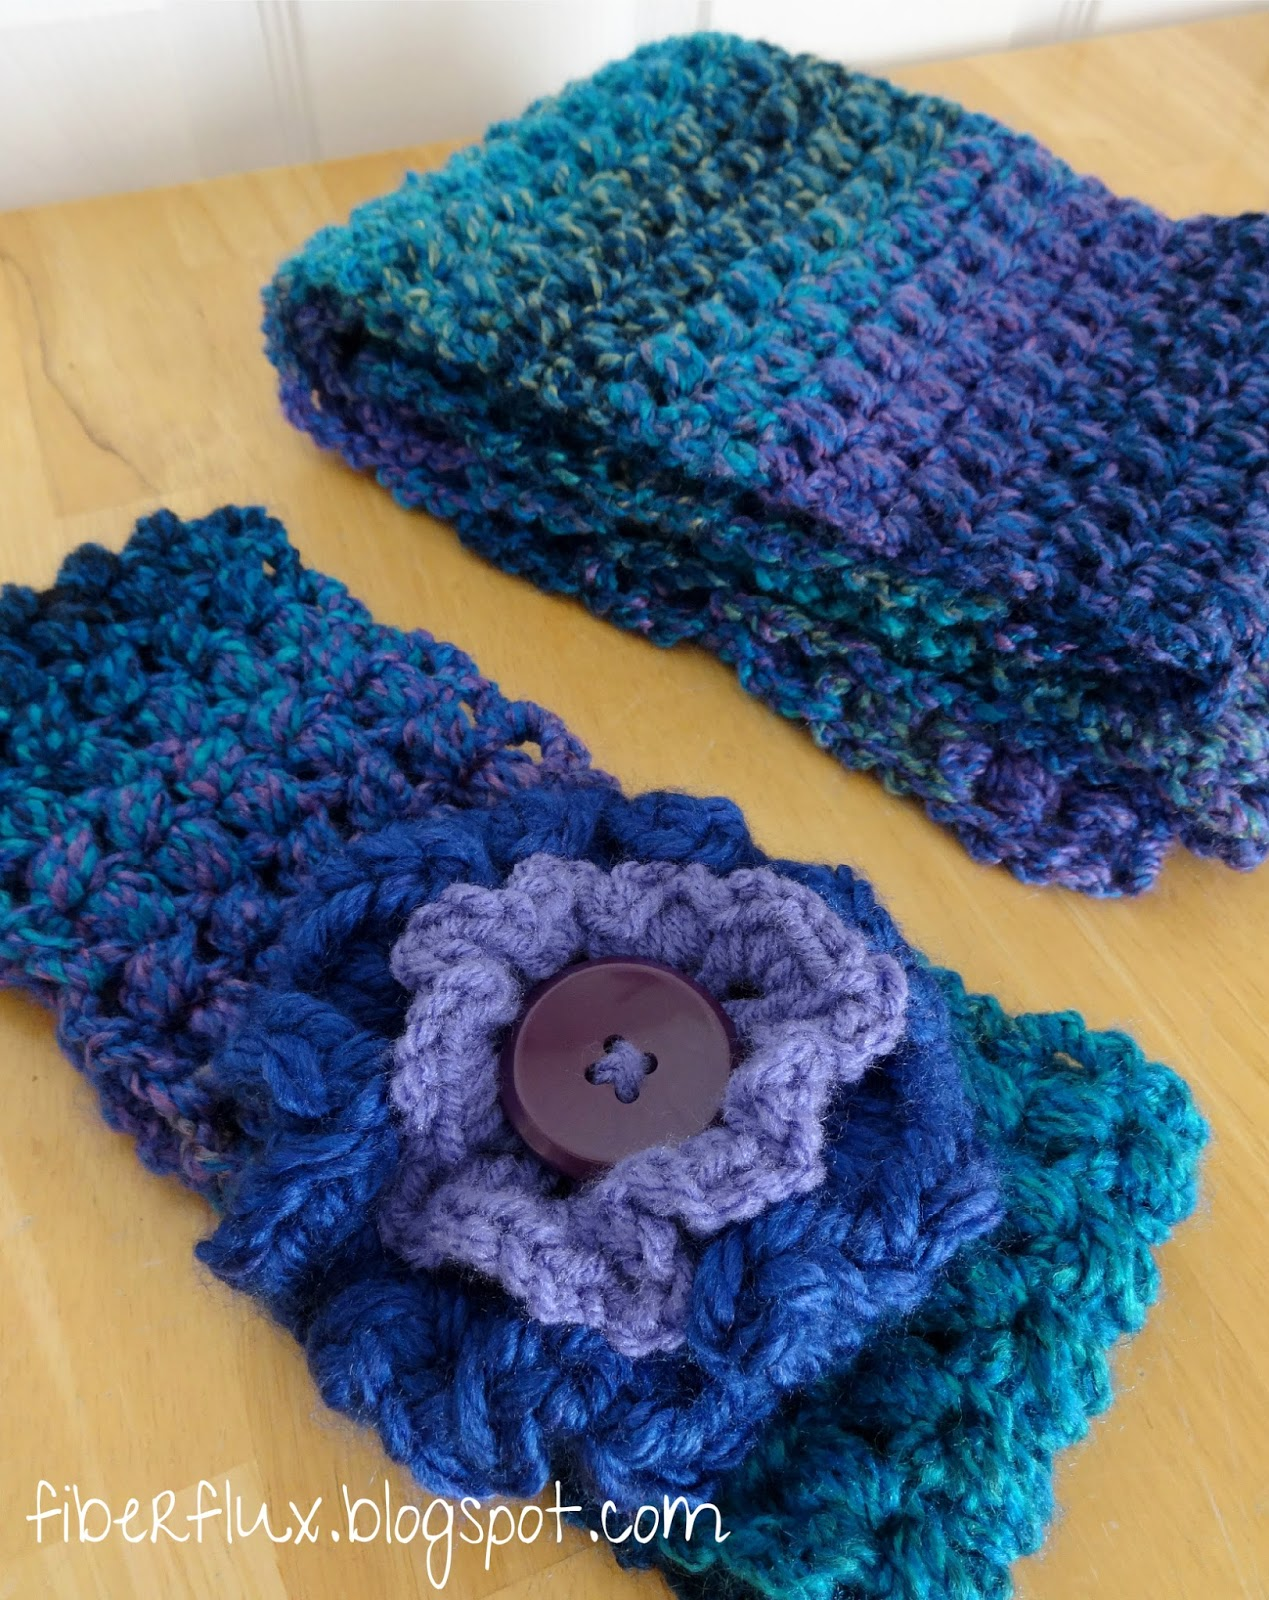 Crochet Puff Stitch Flower Free Pattern : Fiber Flux: Free Crochet Pattern...Tweedy Puff Stitch Ear ...